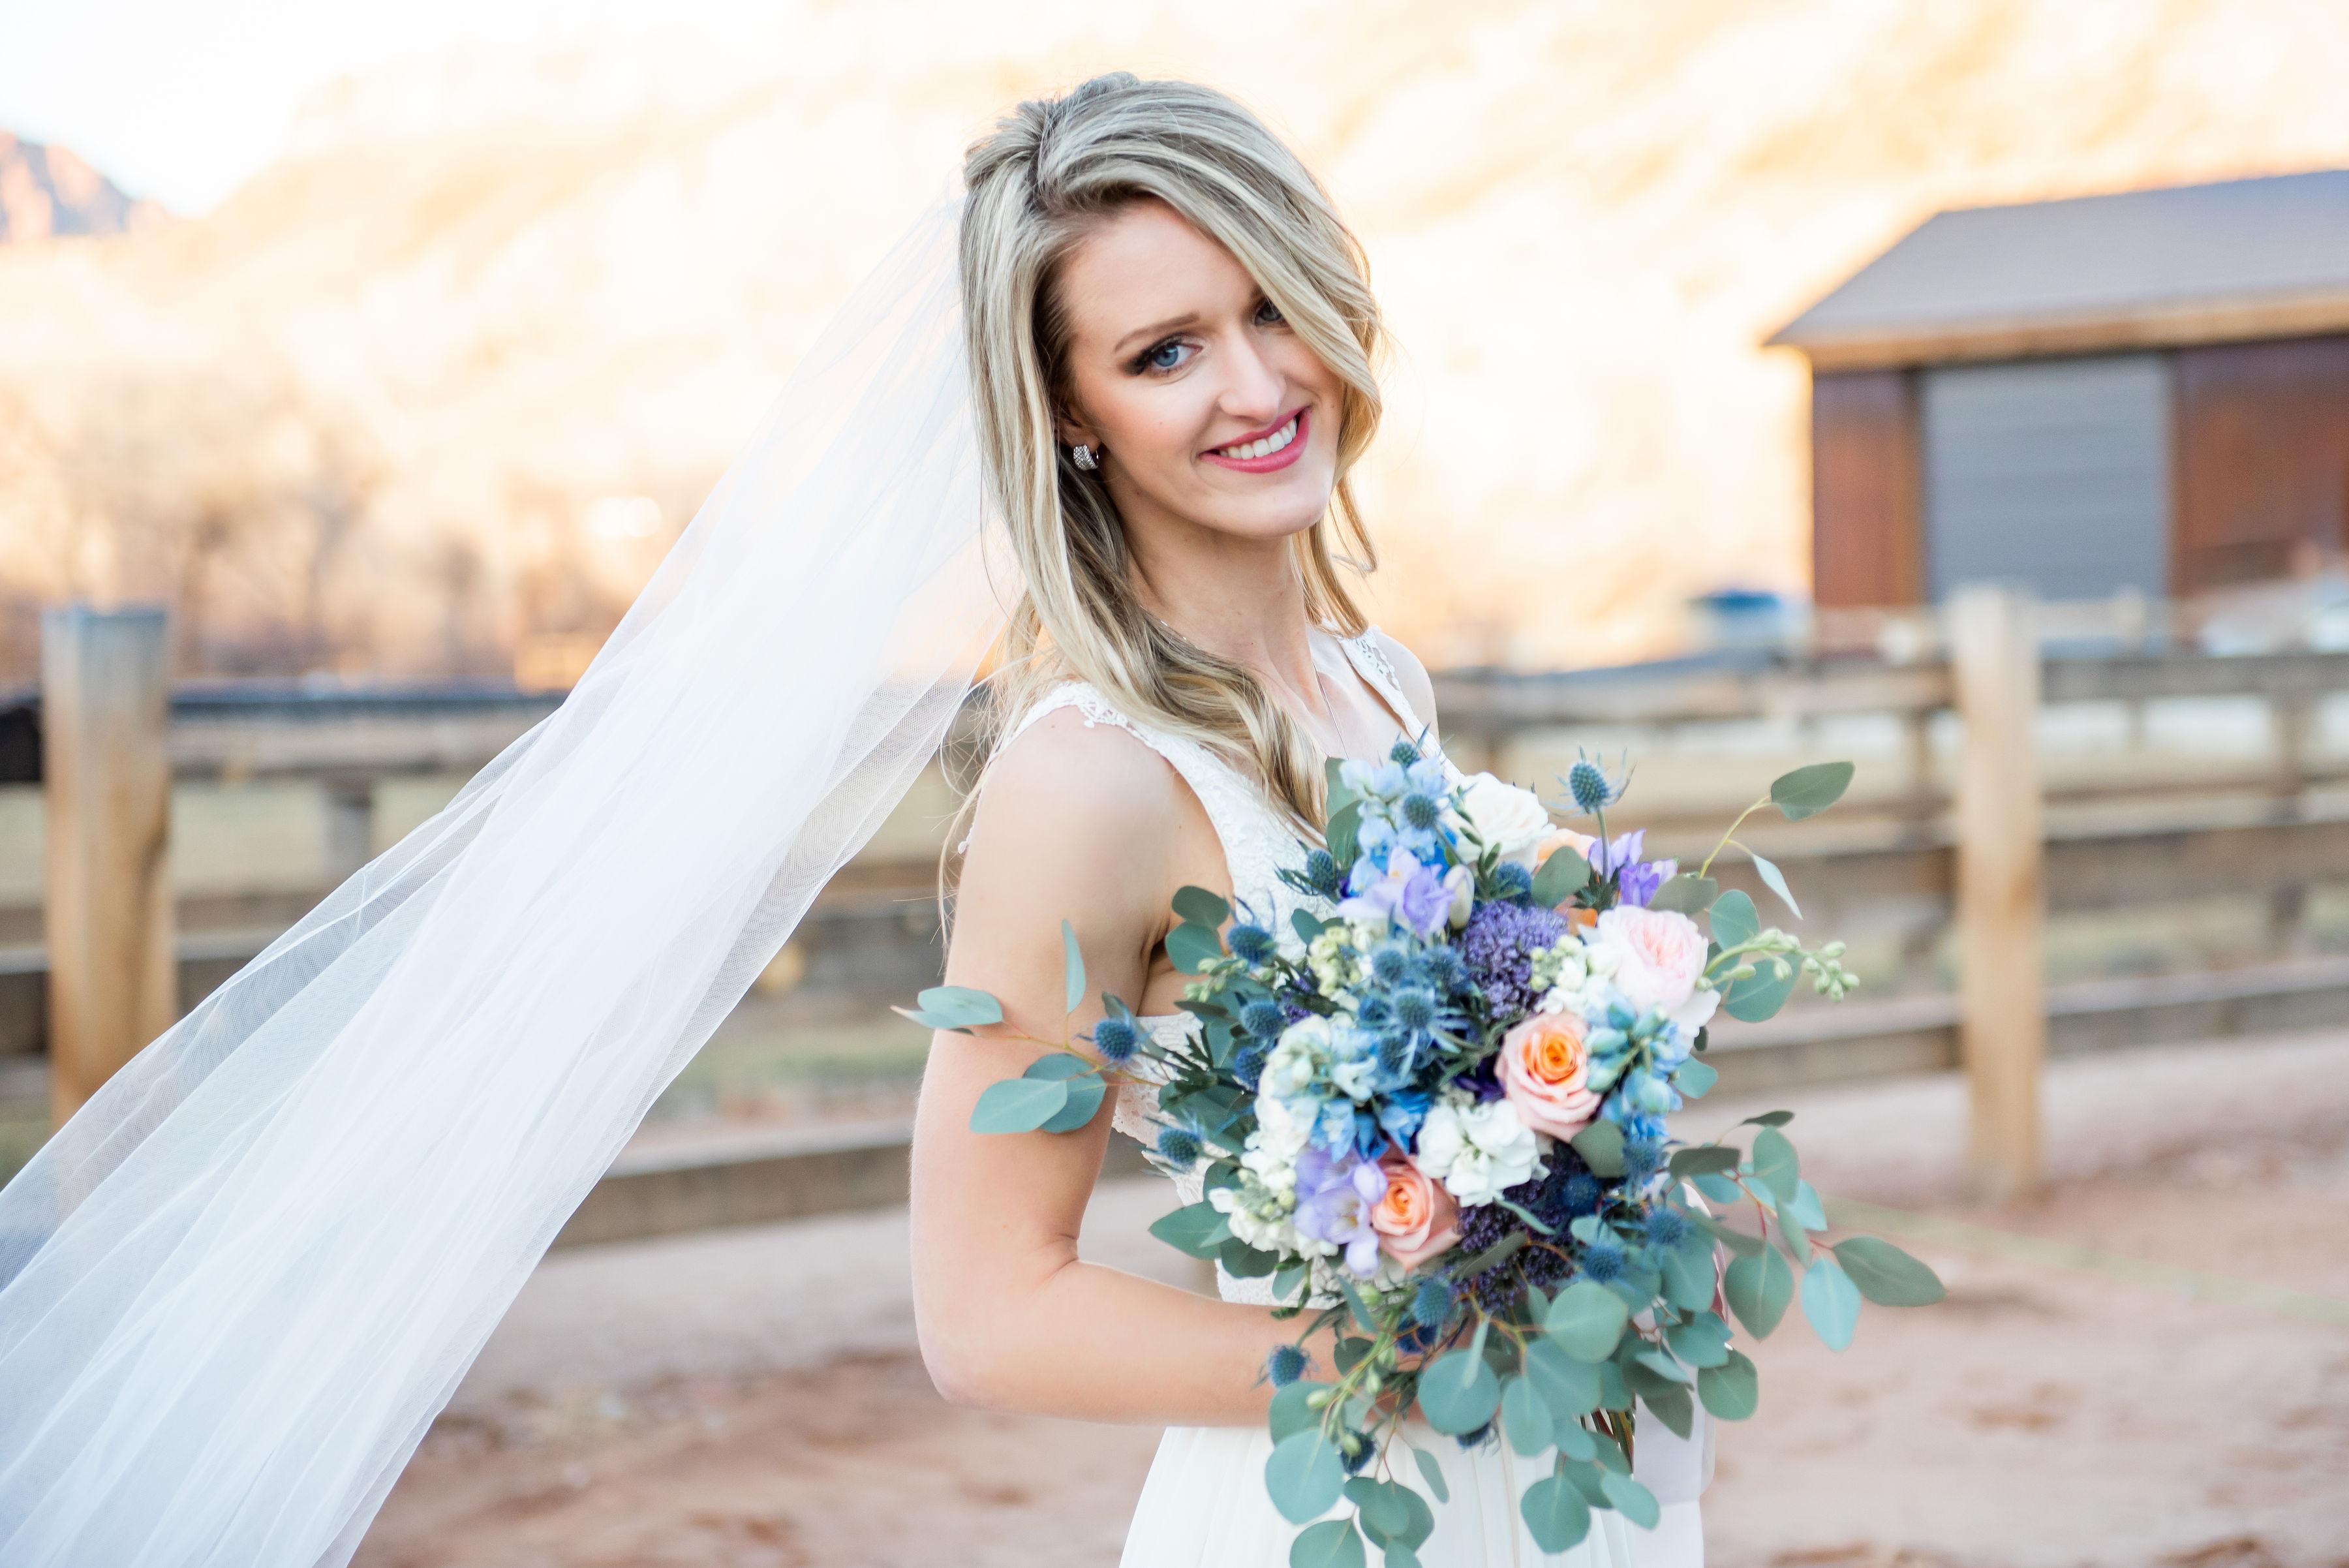 Rent Your Wedding Dress Utah Ficts